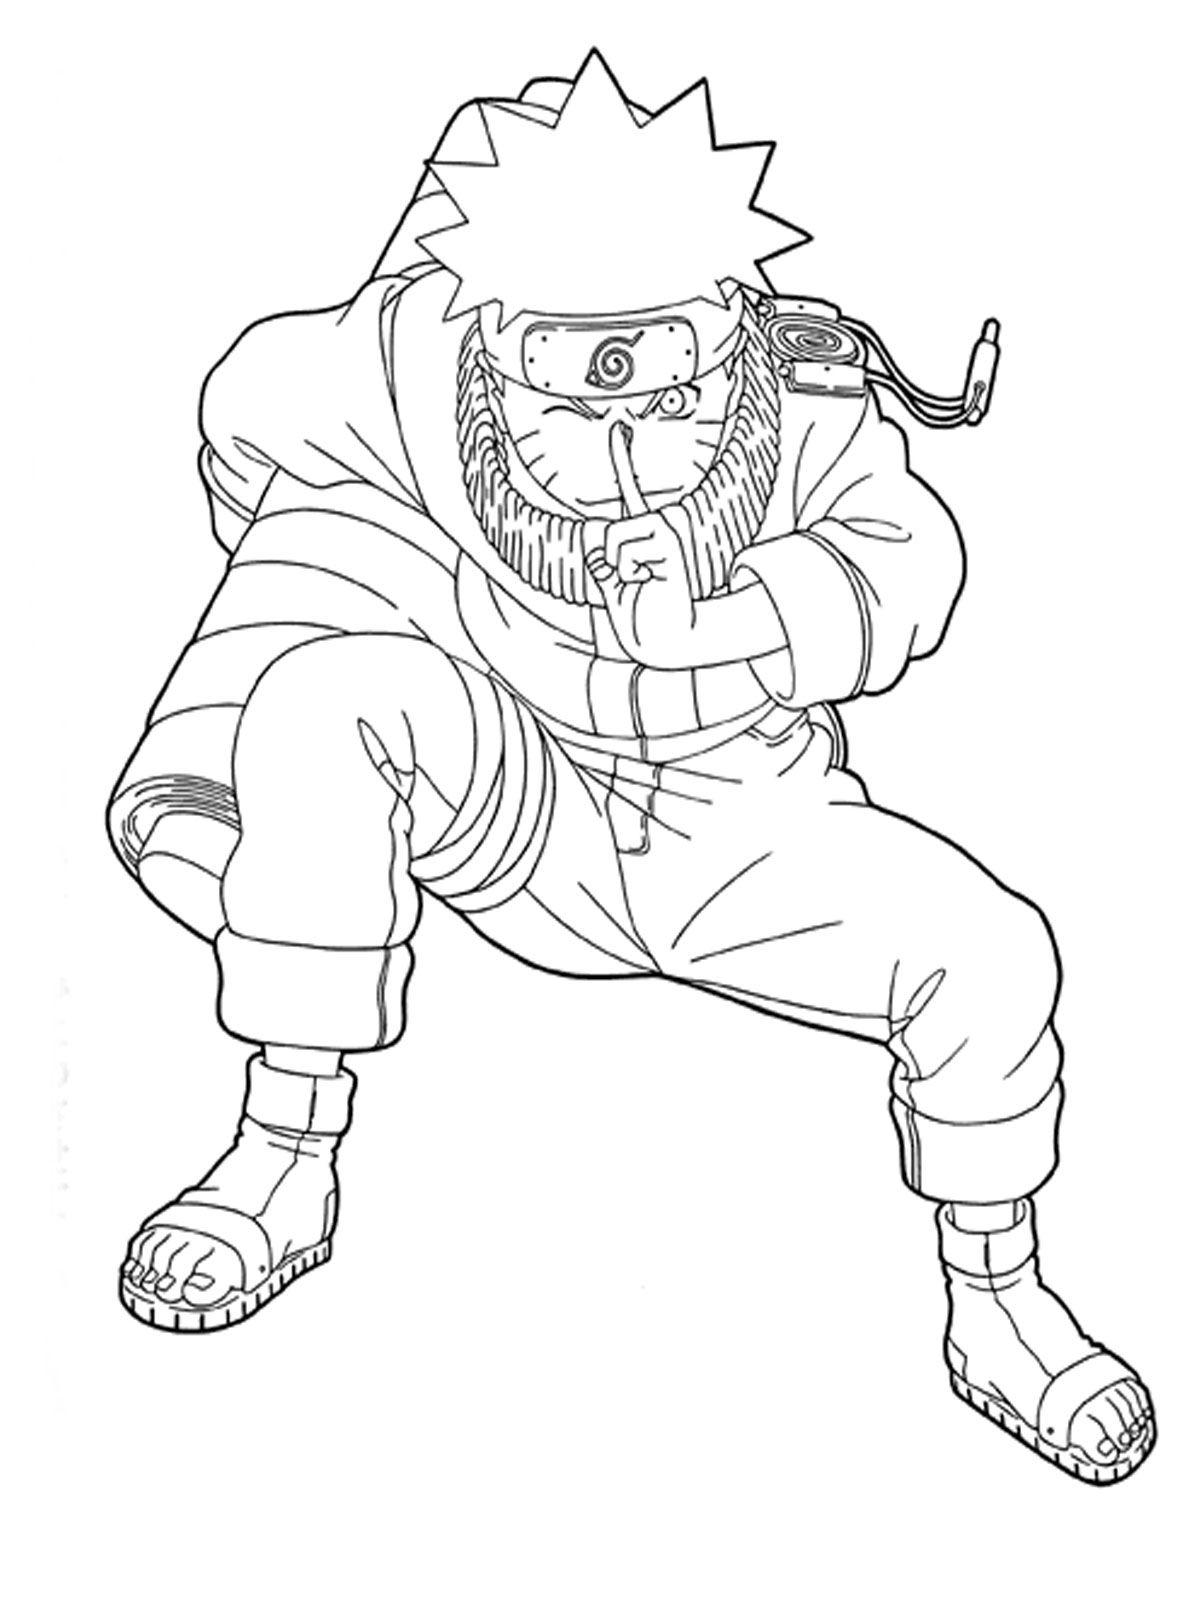 Entre e conheça as nossas incriveis ofertas. Naruto Coloring Pages To Print - Coloring Home